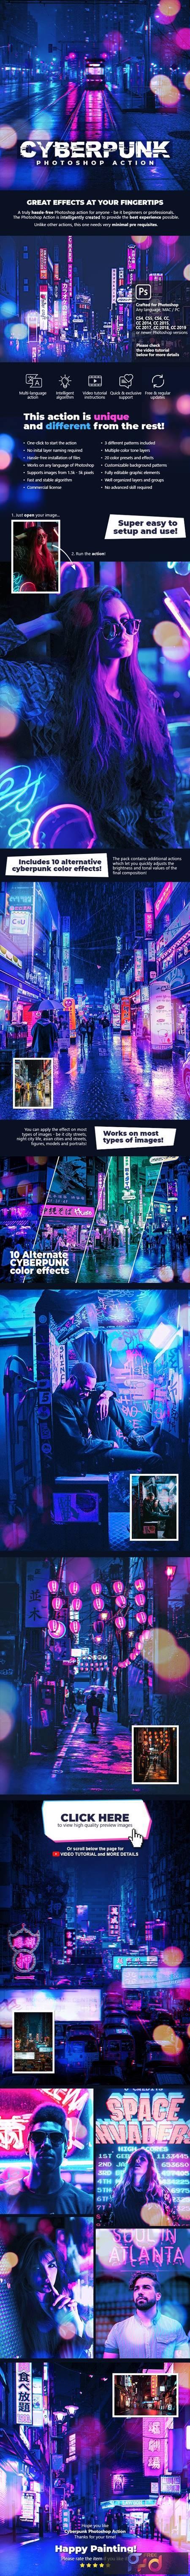 Cyberpunk Photoshop Action 28480390 1